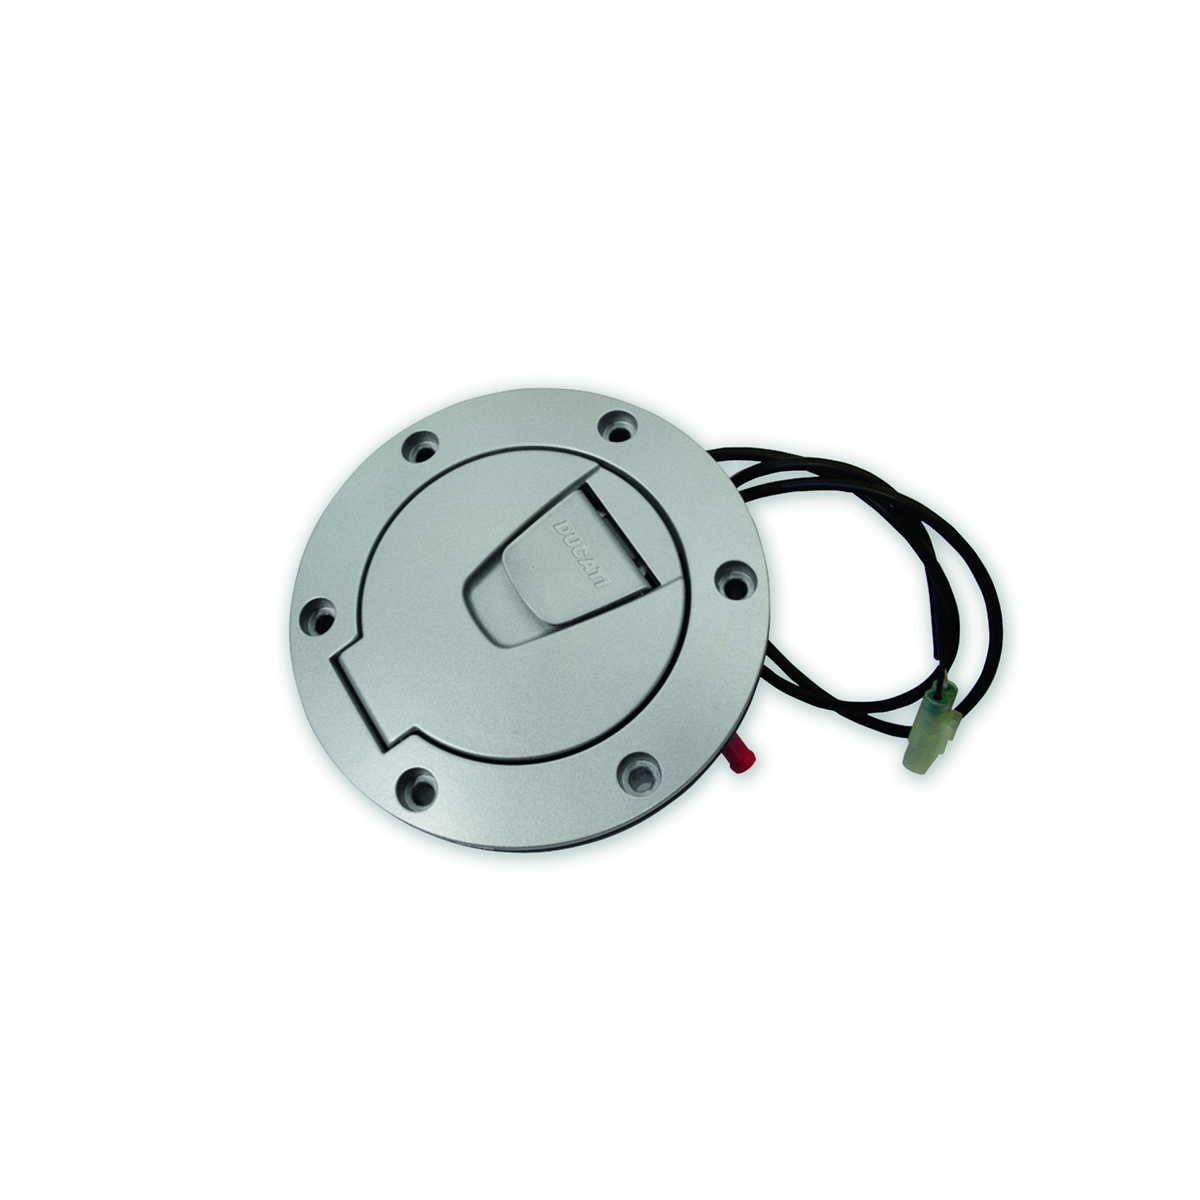 Hands-free tank filler plug.